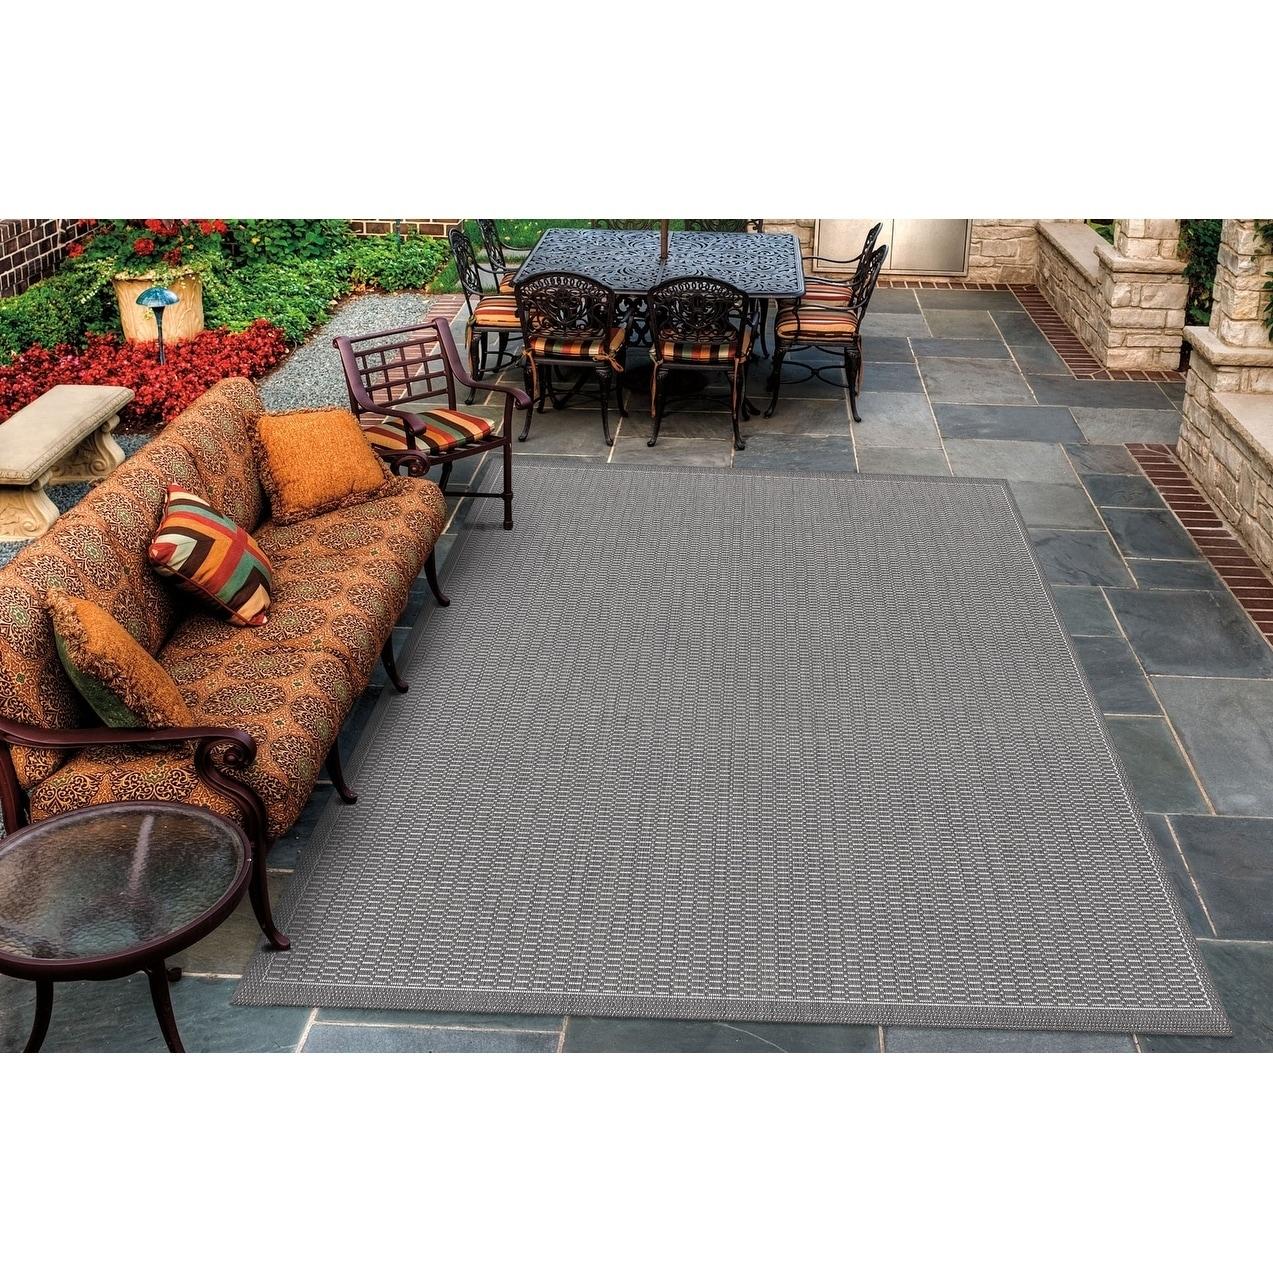 Pergola Deco Grey-White Indoor/ Outdoor Area Rug - 86 x 13 (86 x 13 - Grey/White)